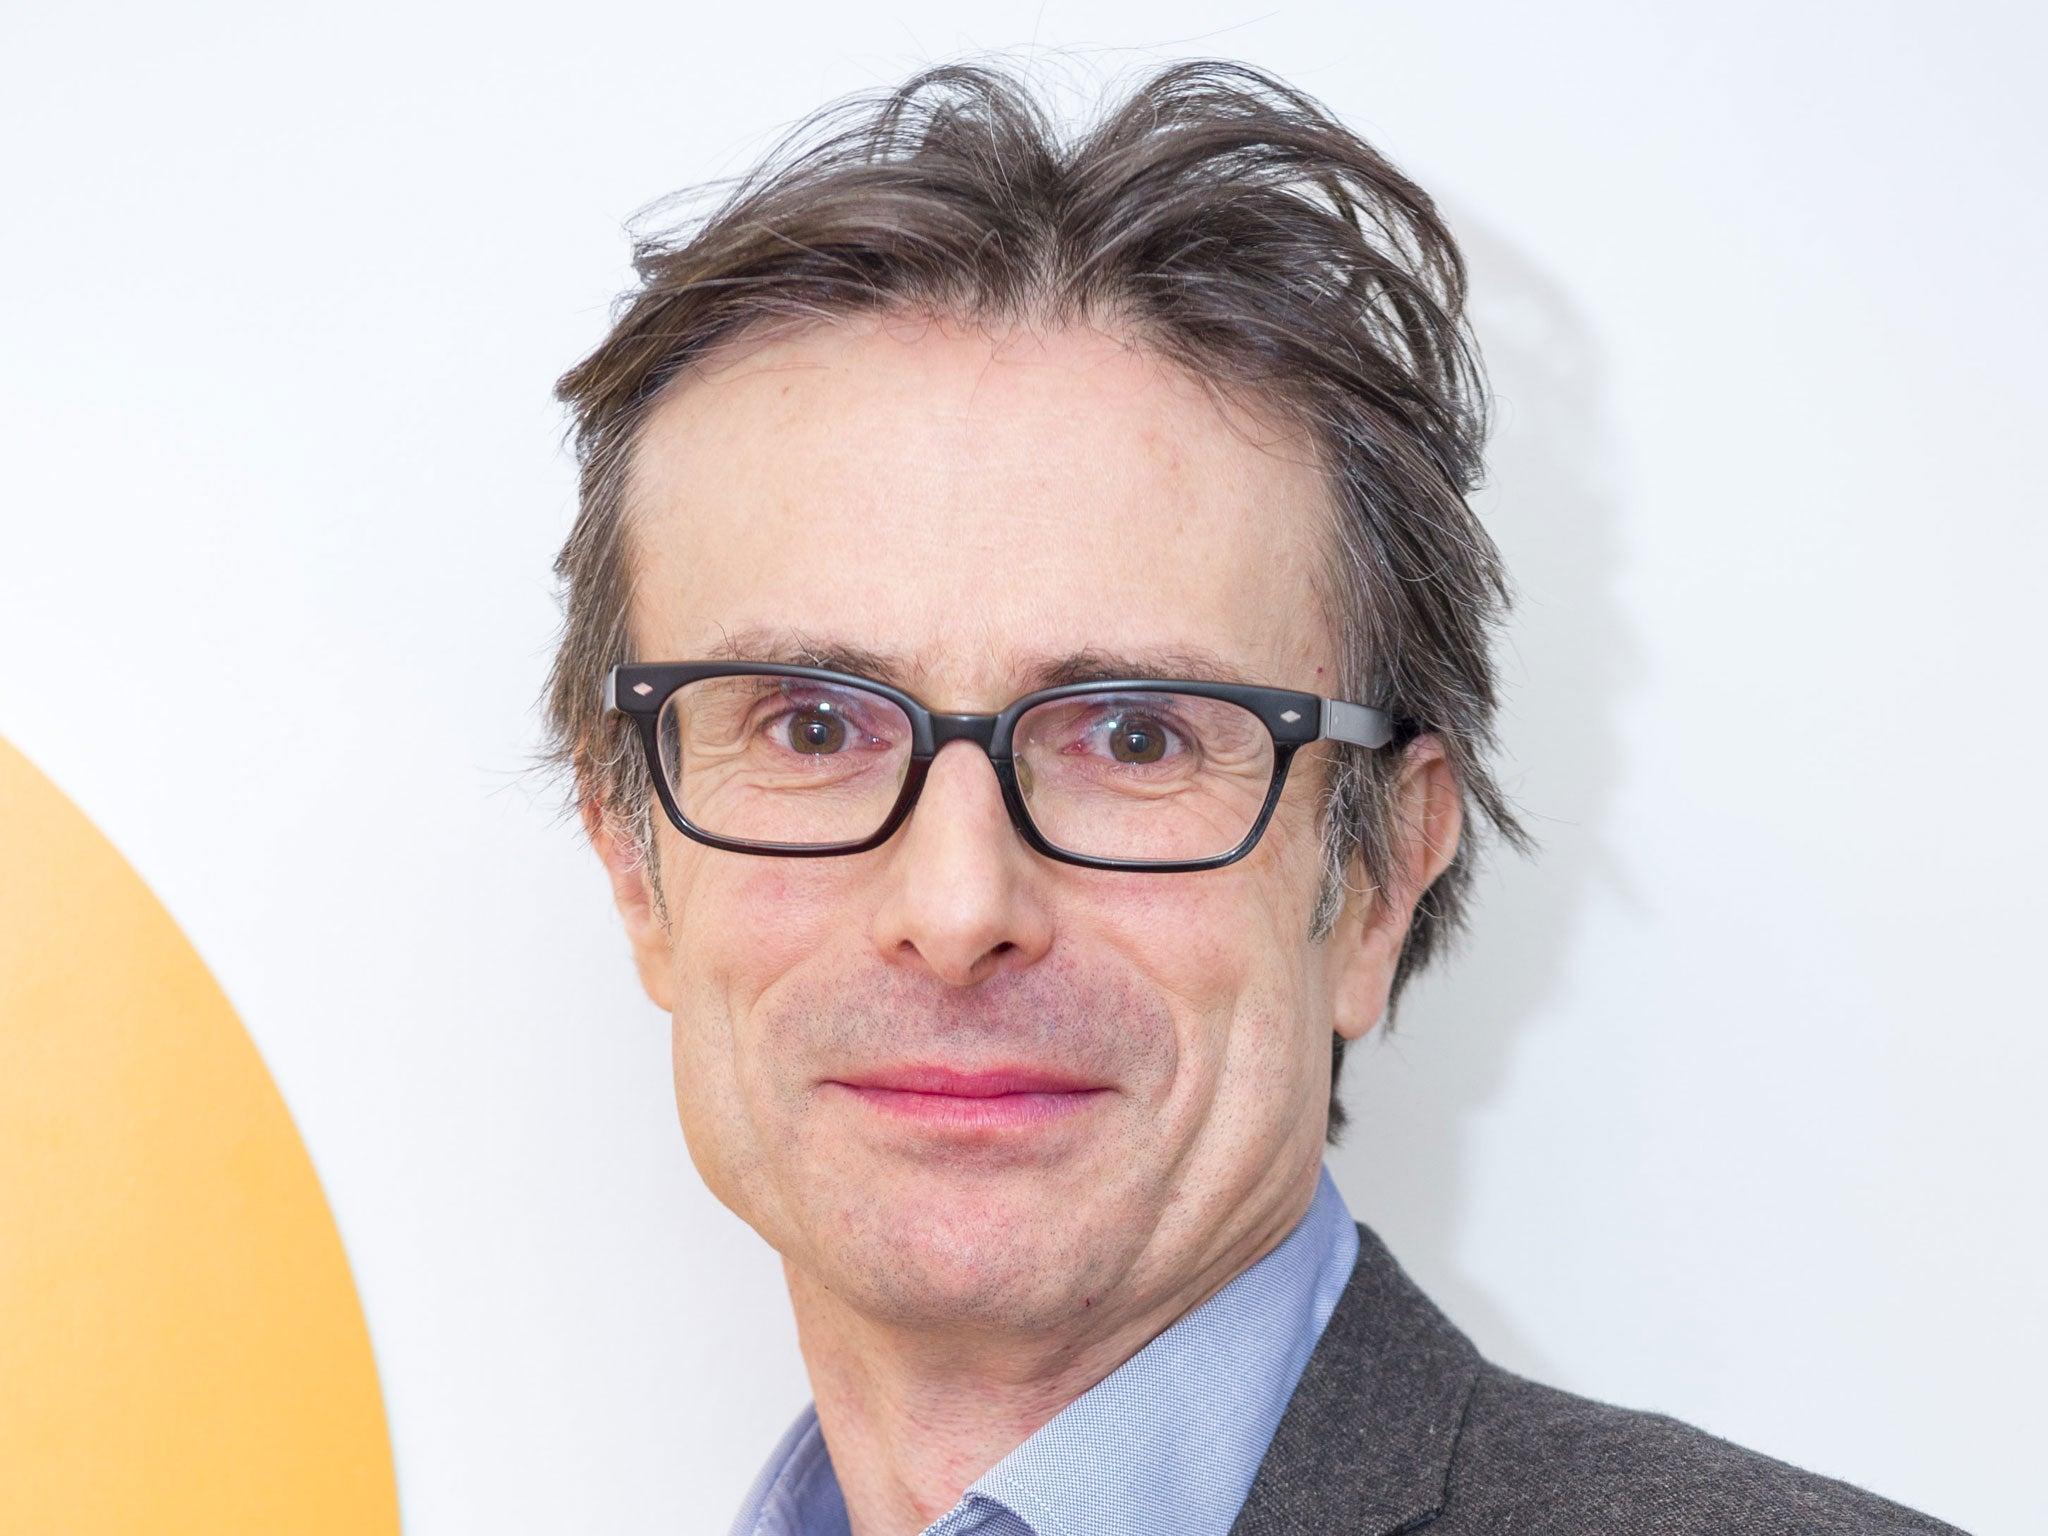 BBC was not impartial during Brexit referendum, ITV's Robert Peston says